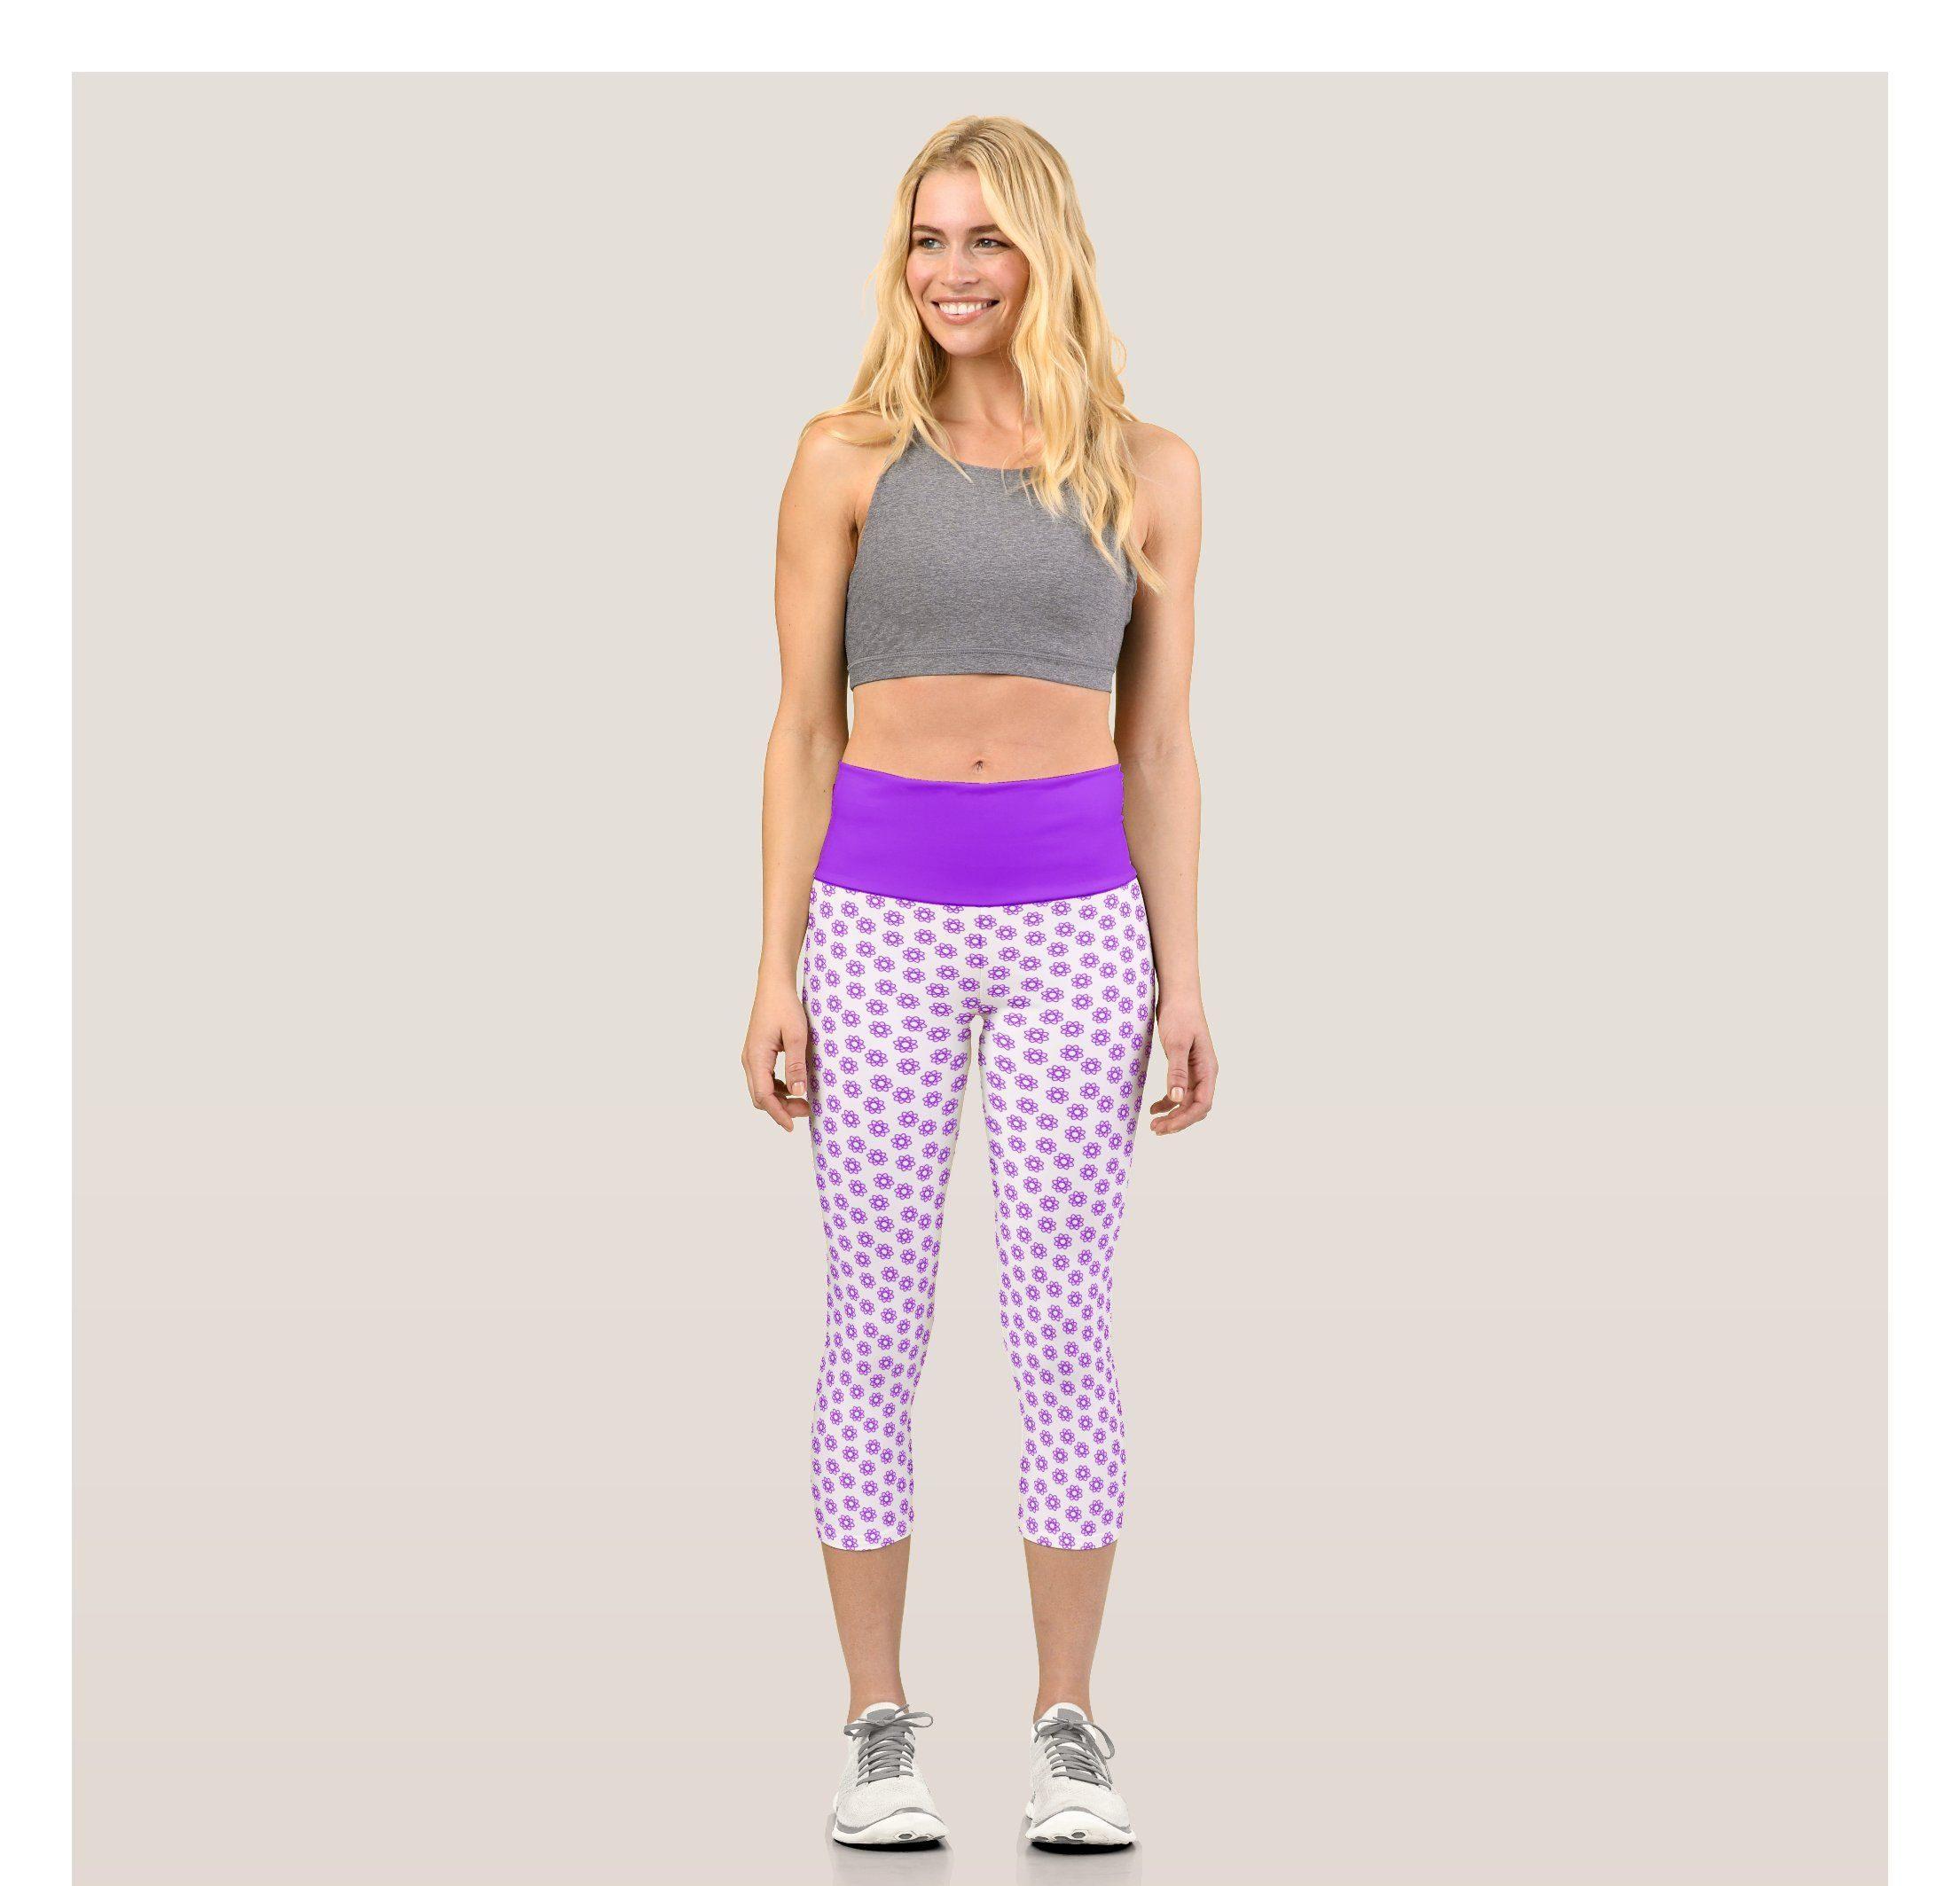 Purple graphic floral pattern capri leggings